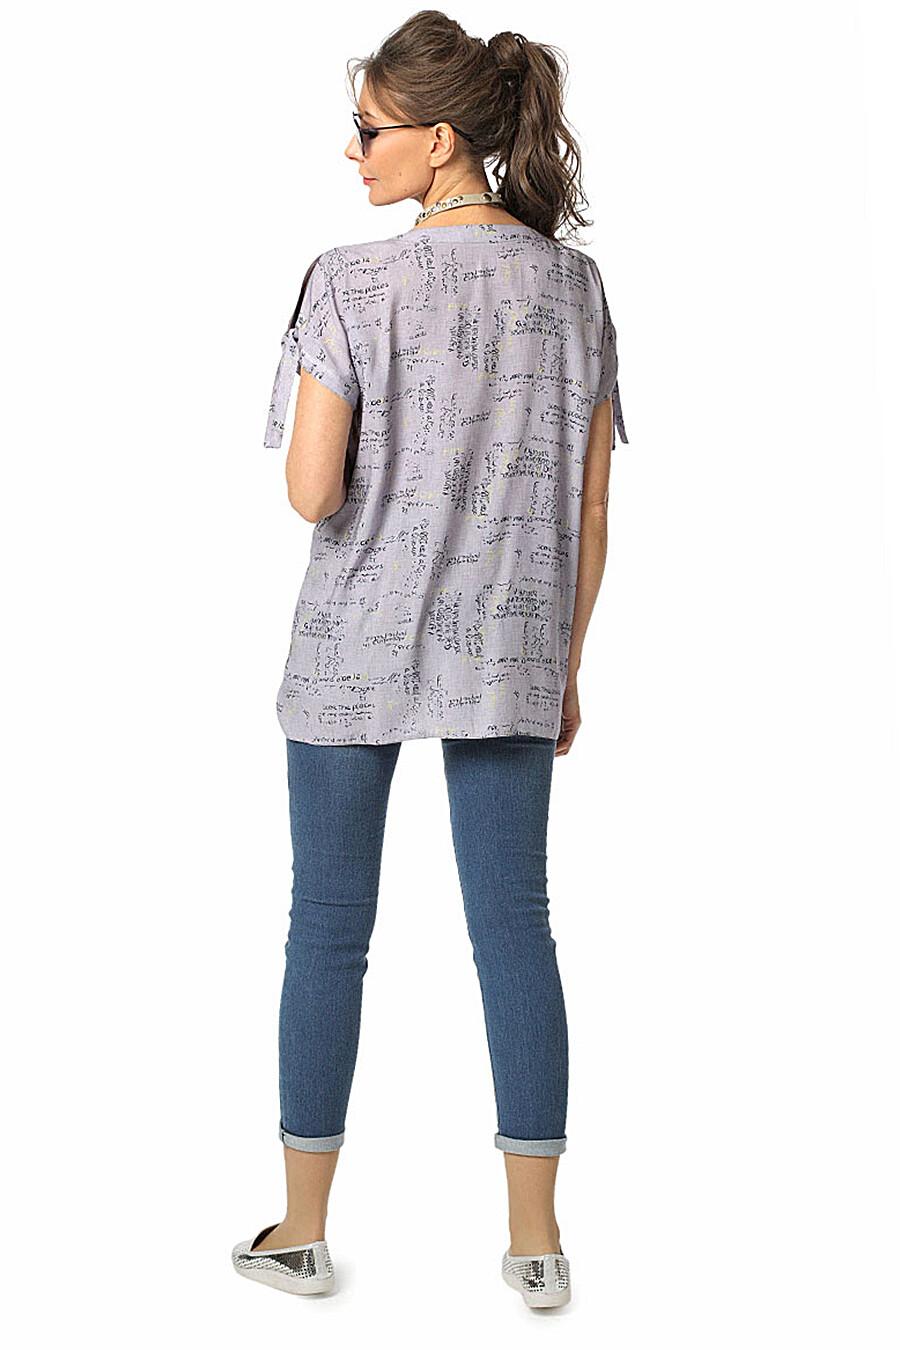 Блуза DIZZYWAY (115510), купить в Moyo.moda